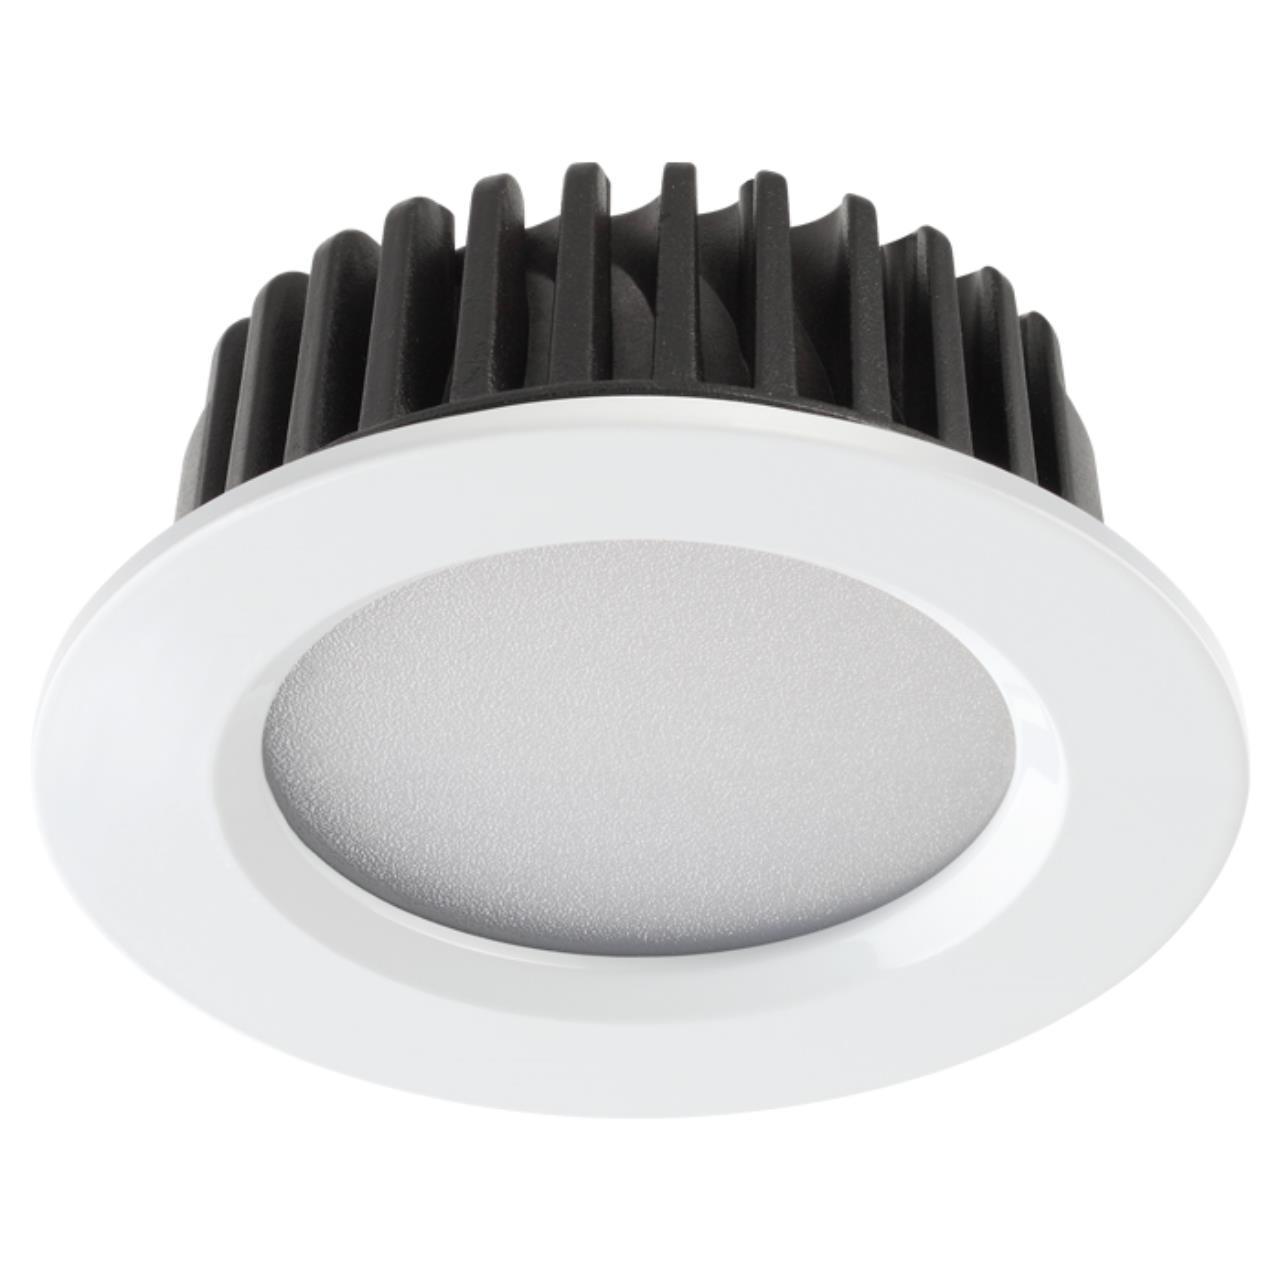 357600 SPOT NT18 090 белый Встраиваемый светильник IP44 LED 3000K 10W 100-265V DRUM